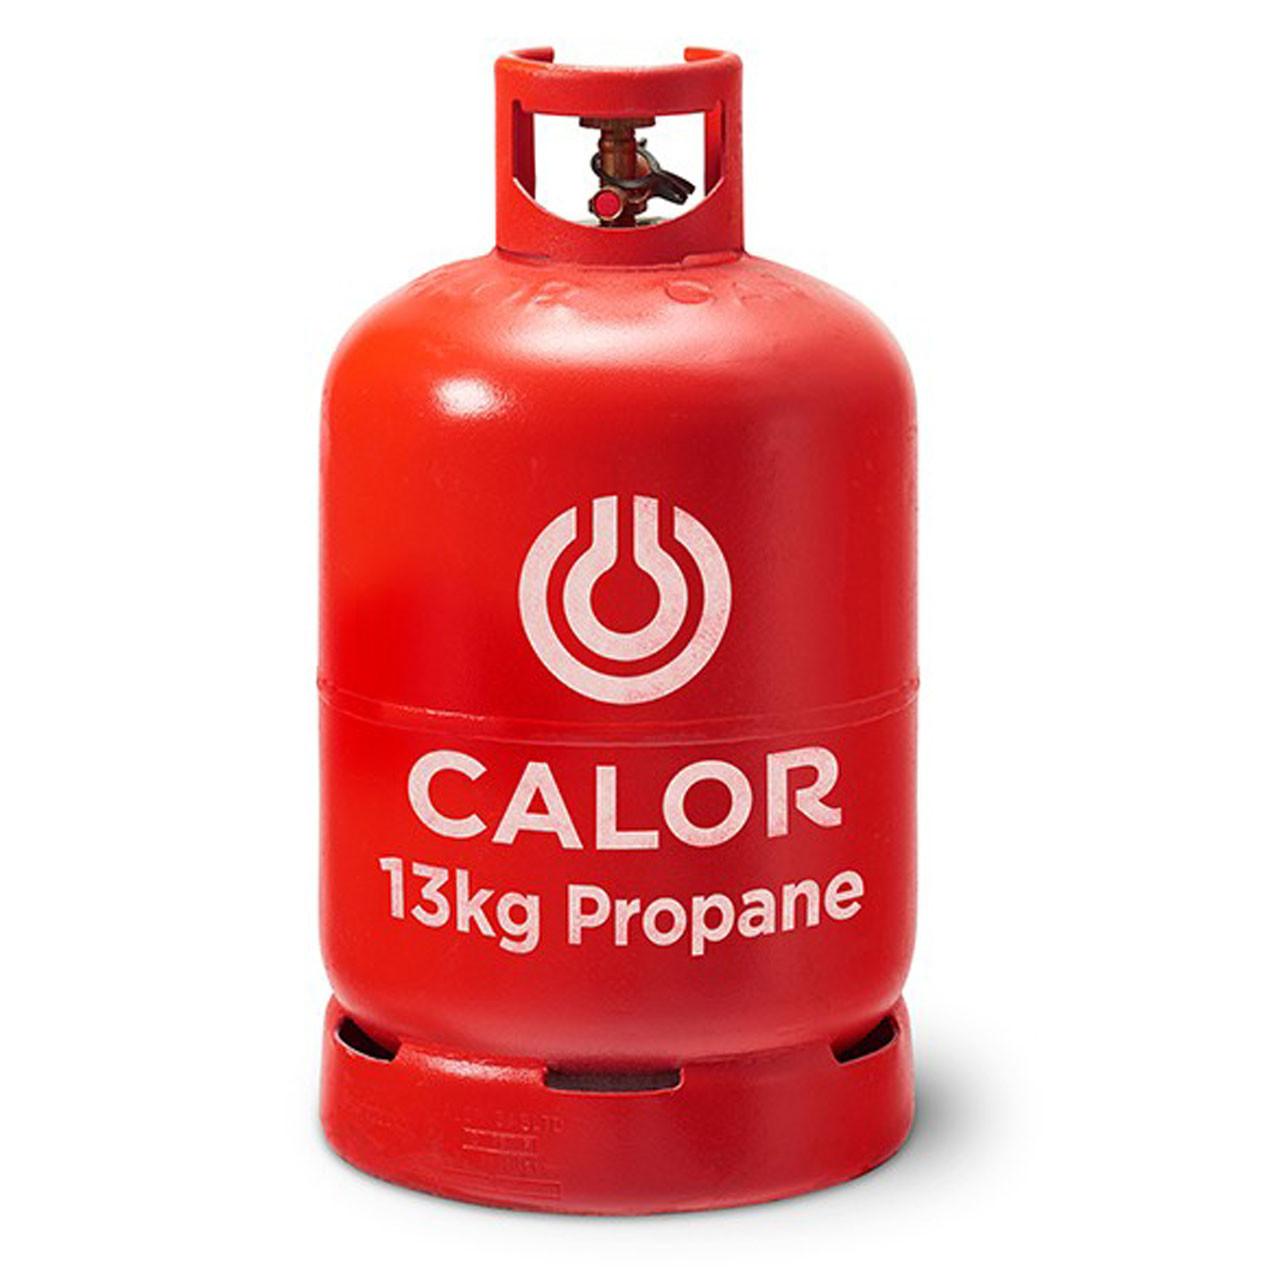 Calor Gas Refill Near Me >> Calor Gas 13kg Propane Refill From Camperite Leisure